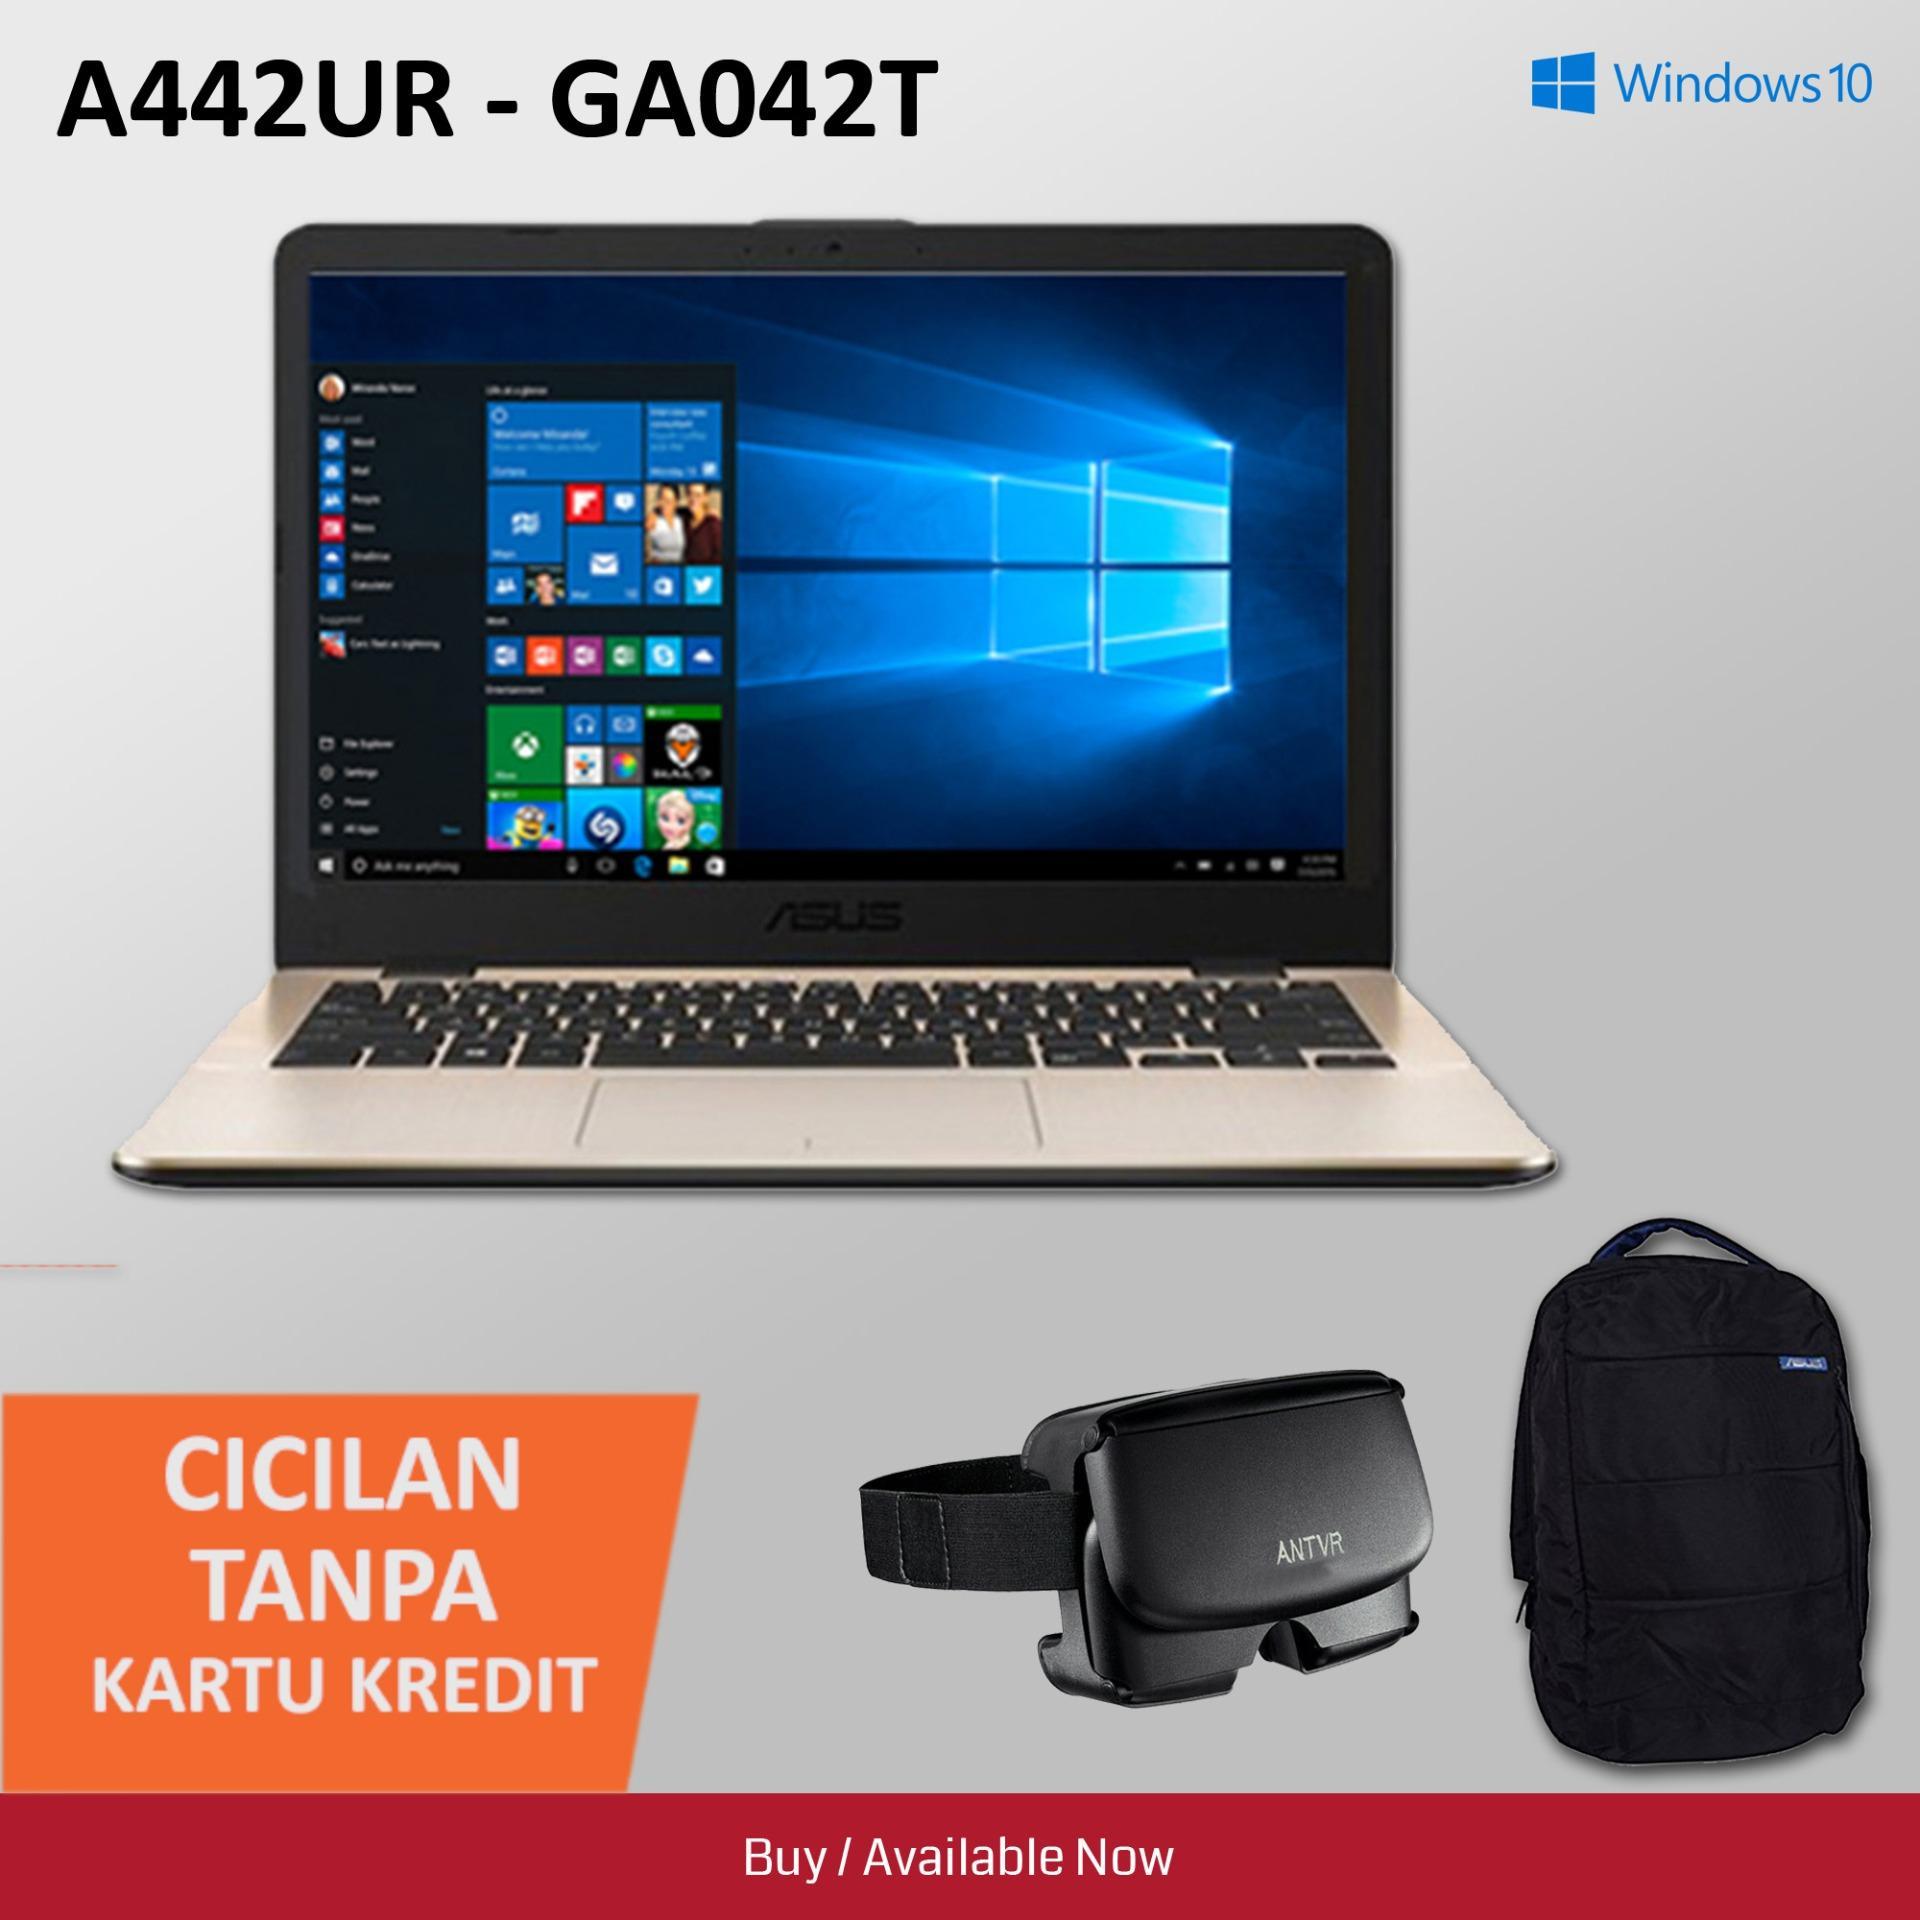 Asus A442UR Notebook [Win 10 Original/ 1 TB/ I5-8250U/ 4GB /  GeForce GT 930MX] + Free Virtual Reality & Backpacks